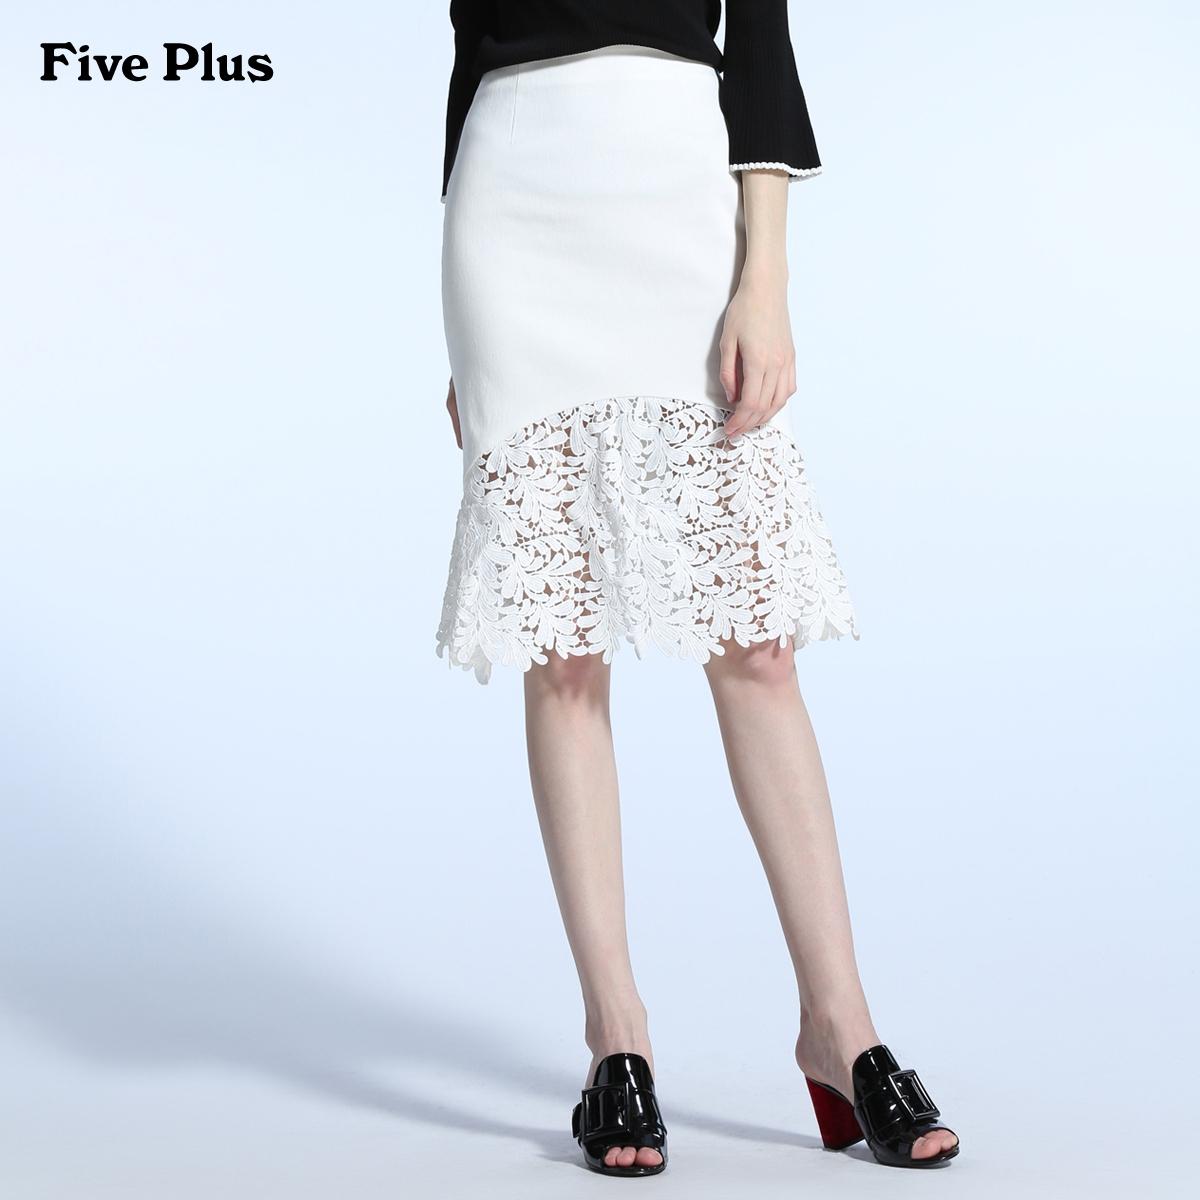 Five Plus新款女装拼接蕾丝半身裙高腰中长款鱼尾包臀裙棉质镂空